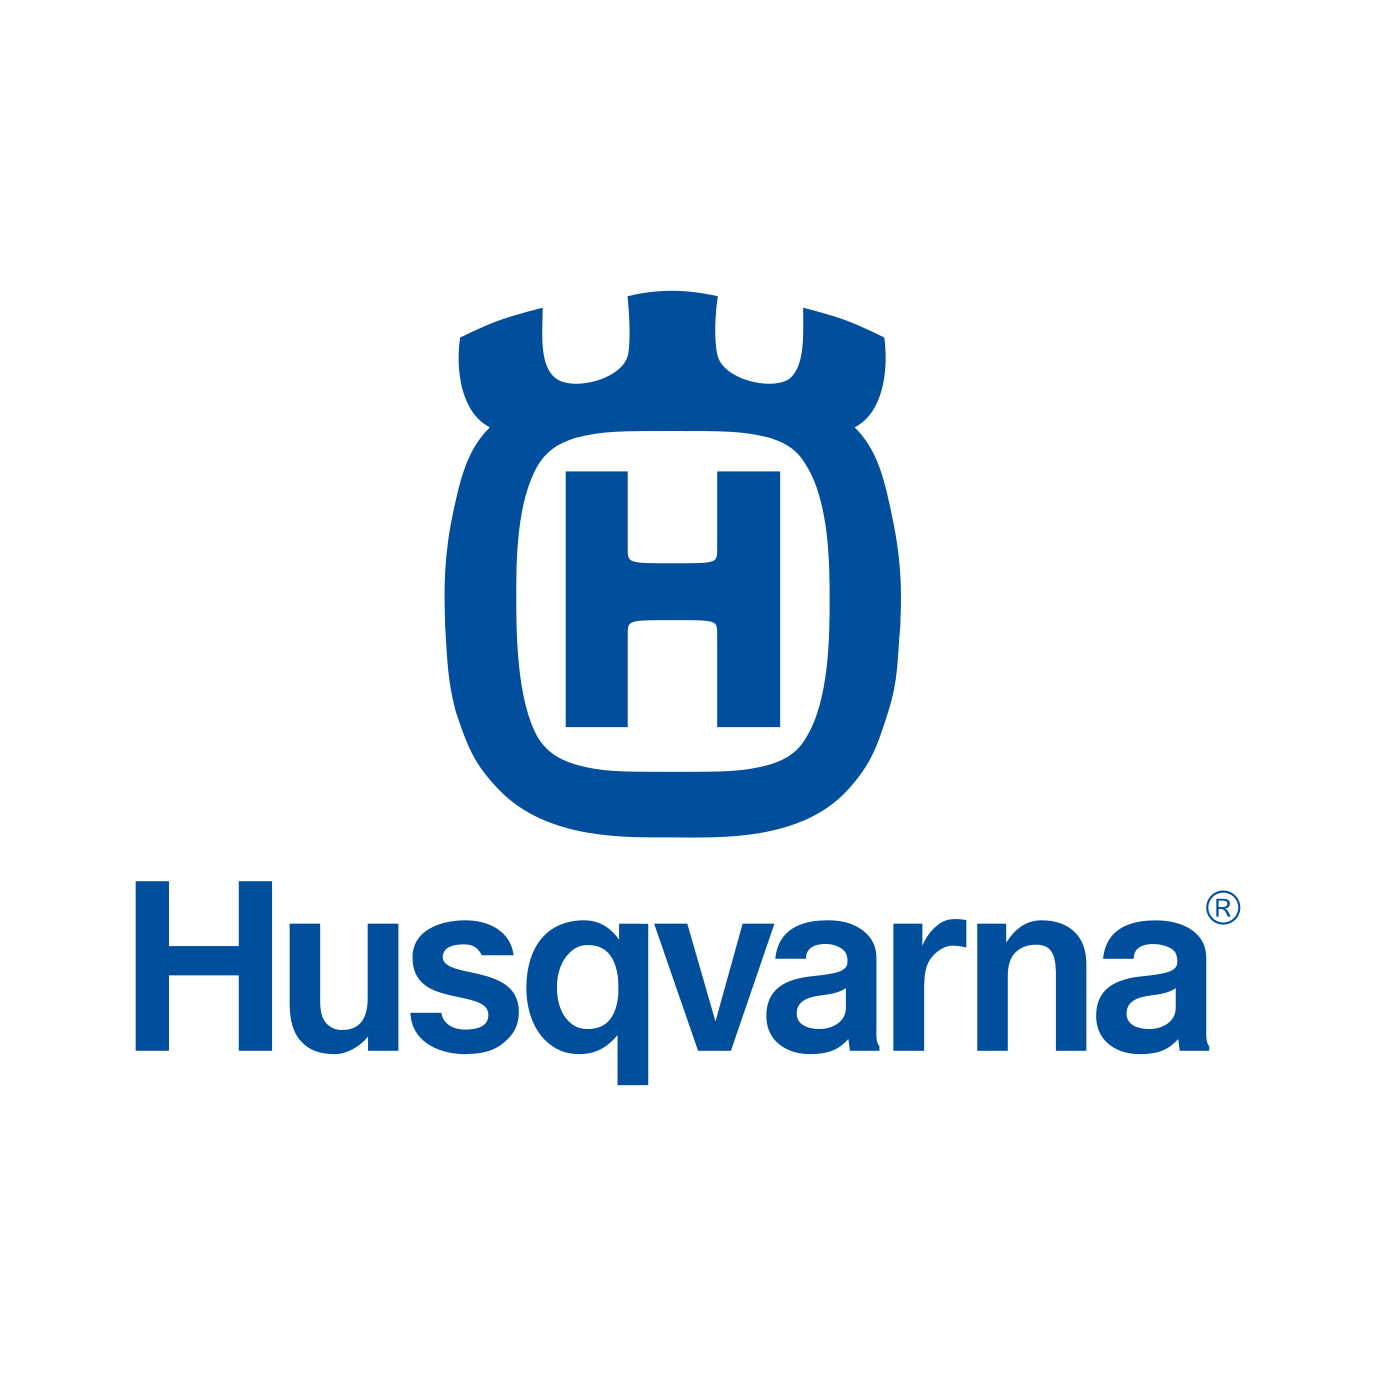 husqvarna logo 0 - Husqvarna Logo